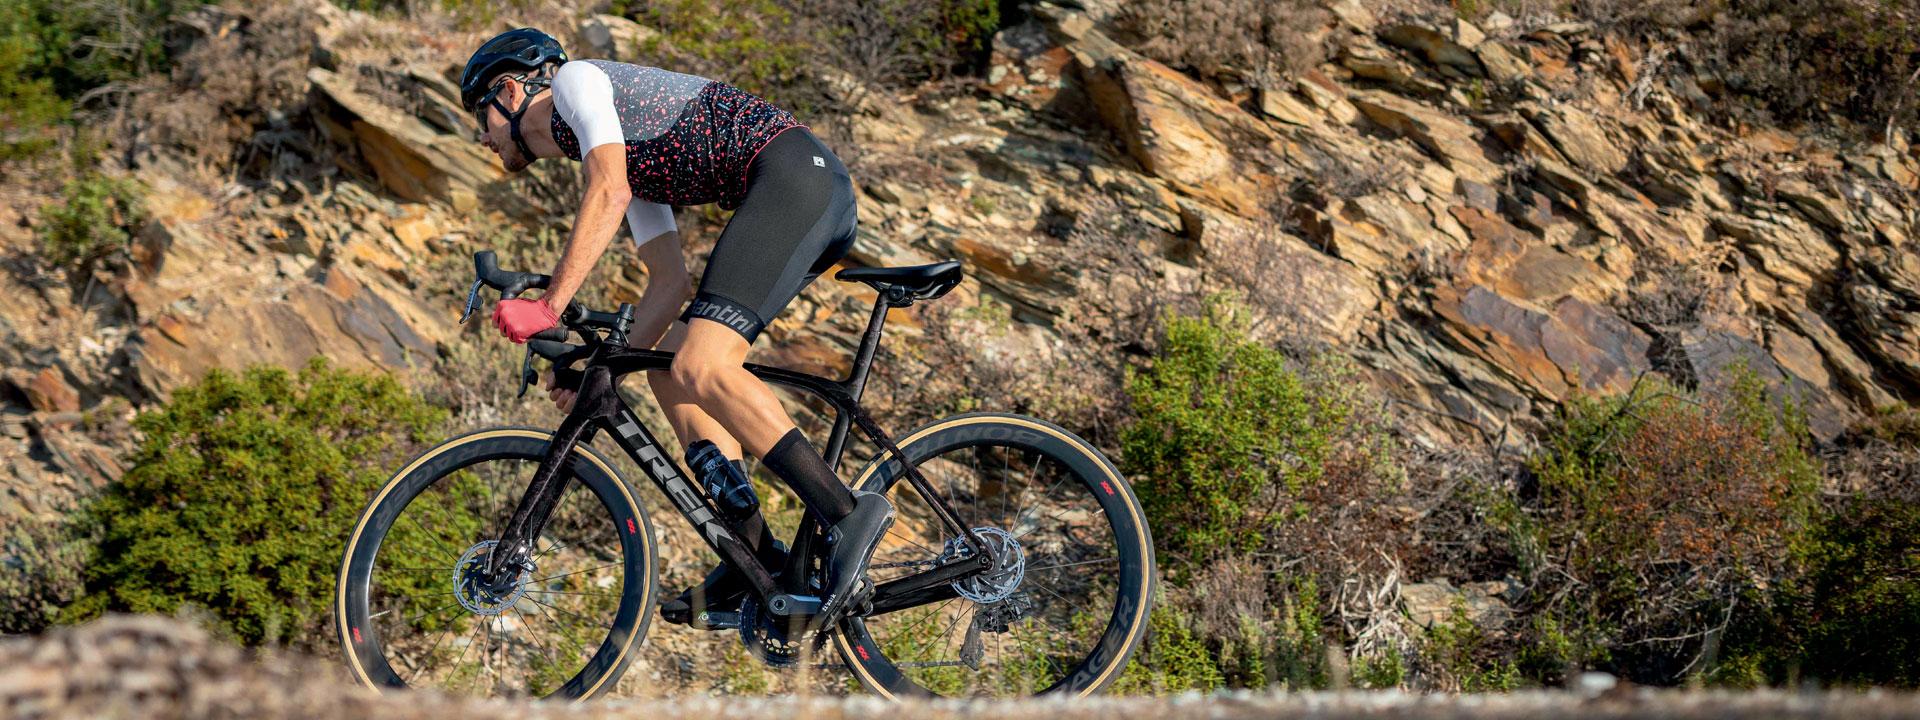 Santini Karma Mille Cycling Bib Shorts in Winery GITevo Pad